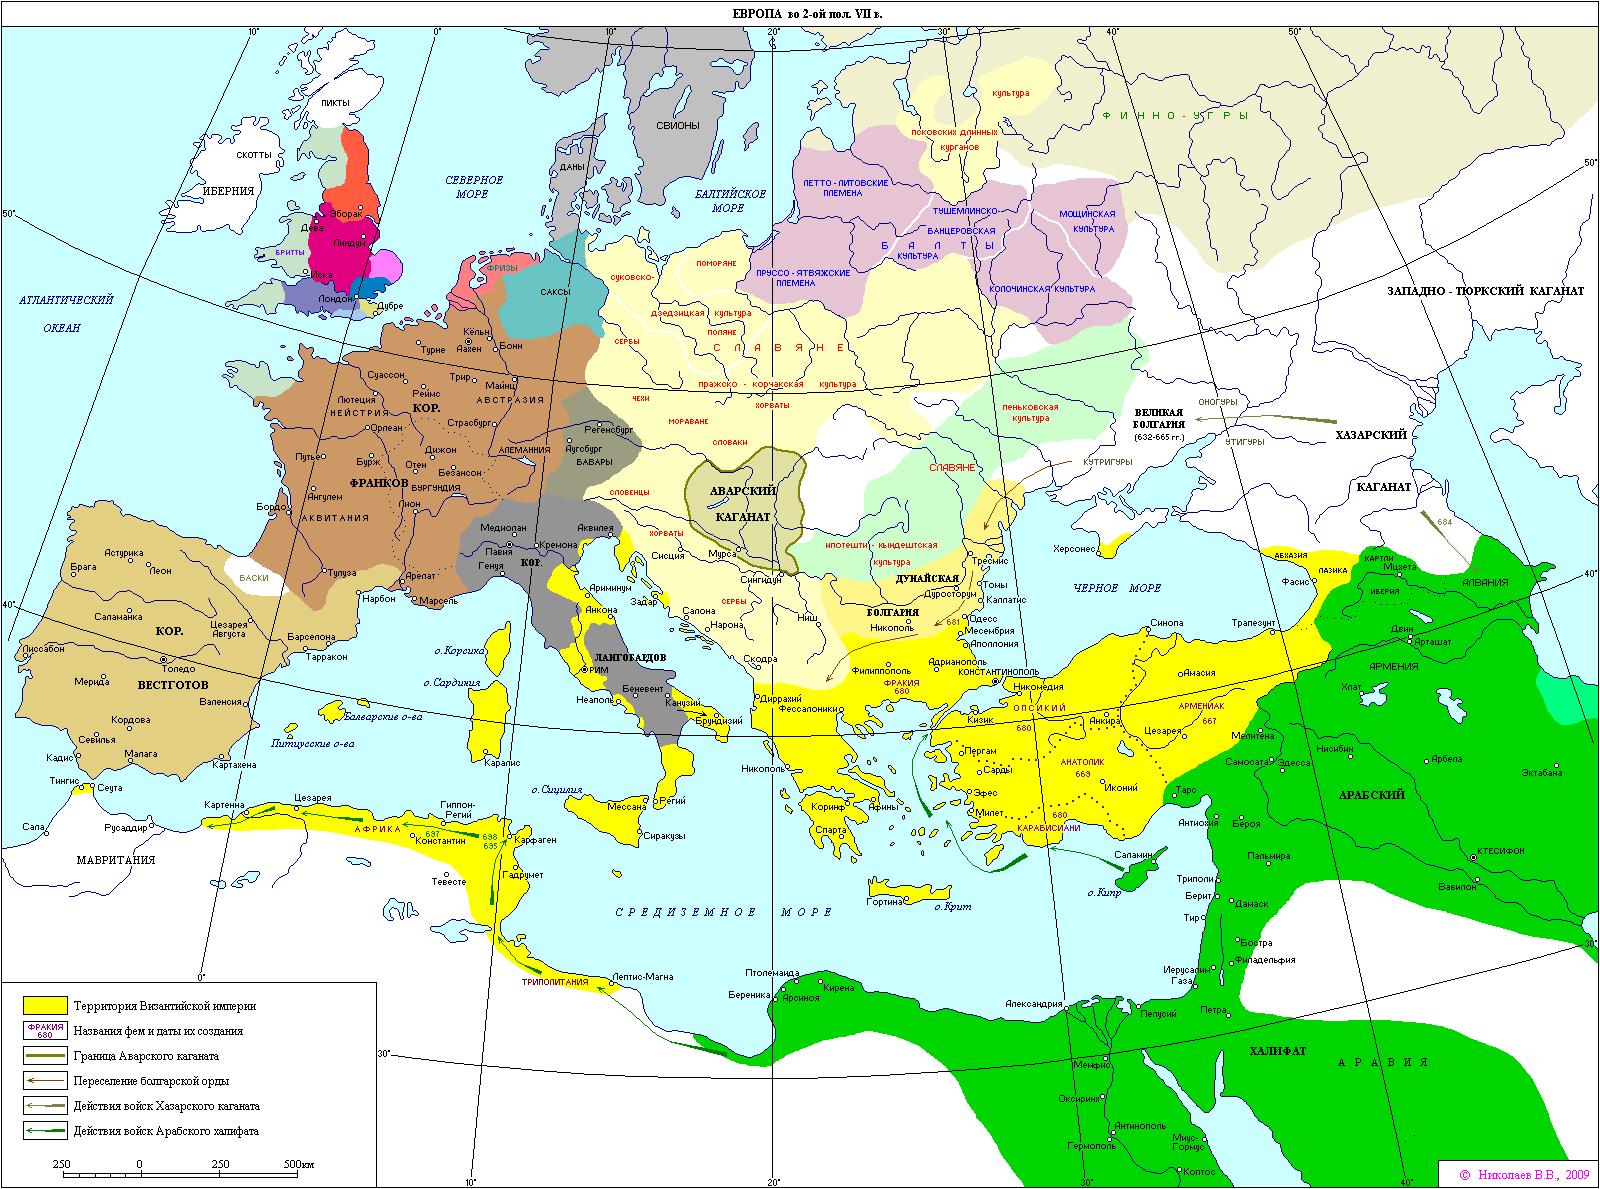 016-europe650-700